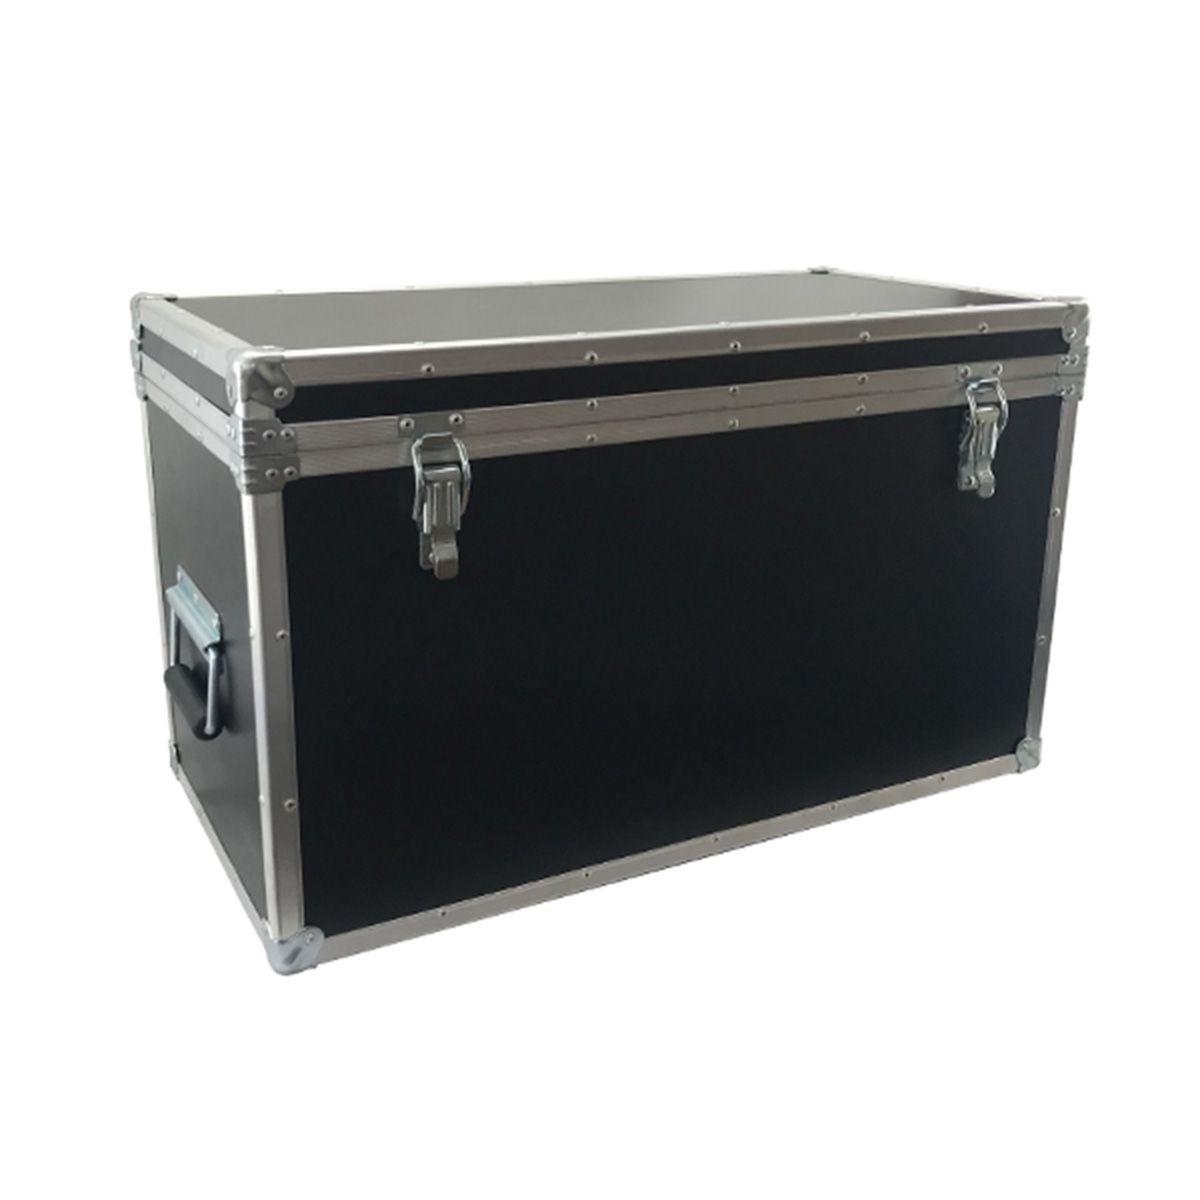 Hard Case Baú para Cabos 60 x 30 x 30cm - RS  - RS Som e Luz!